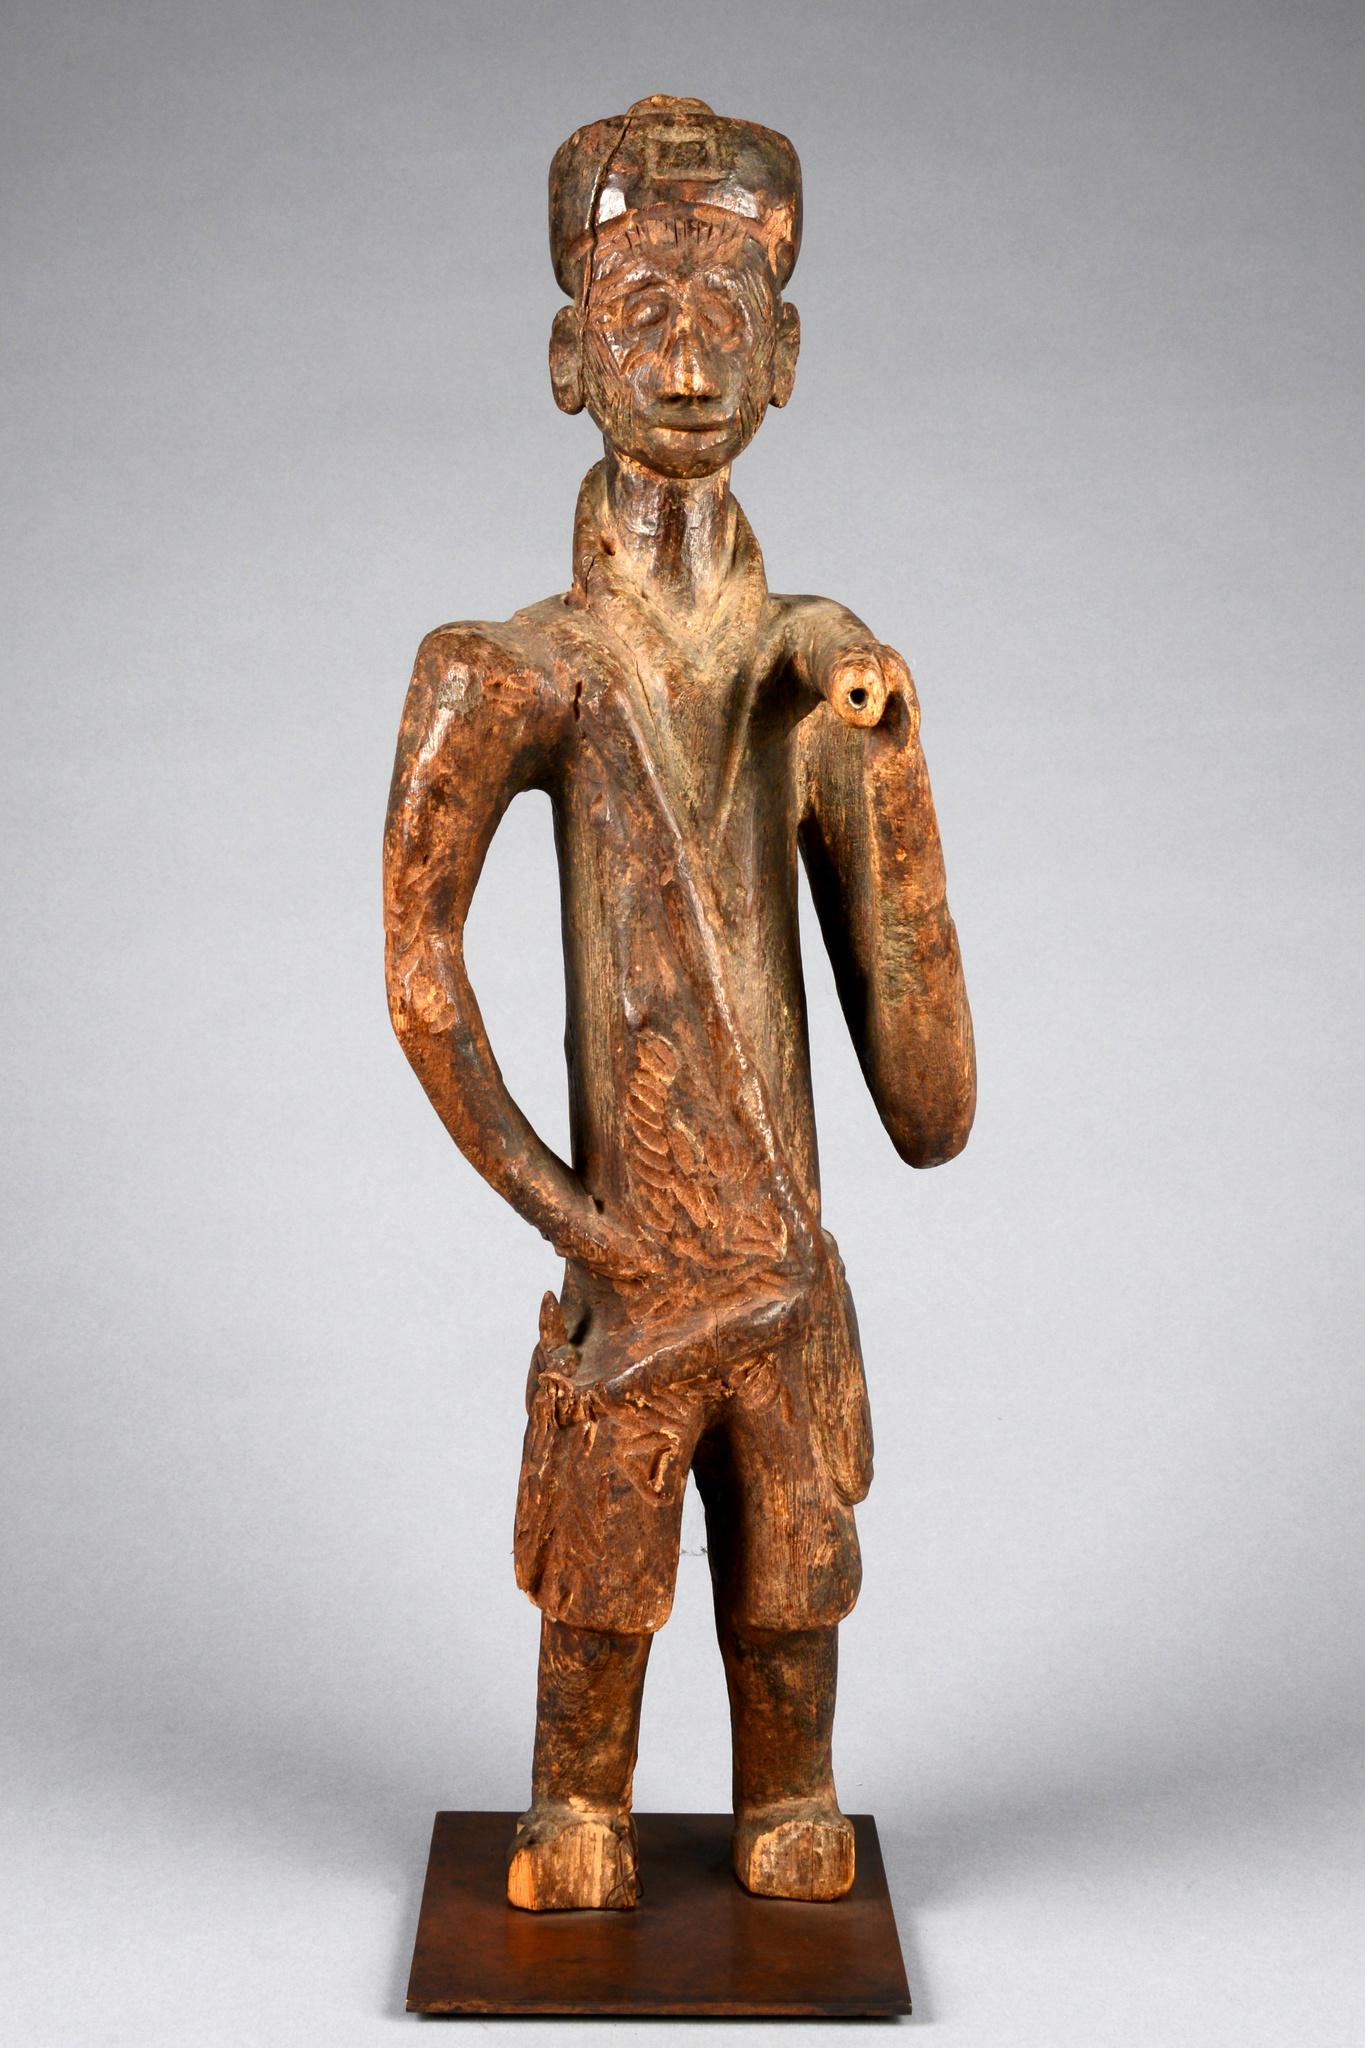 Standing colon figure